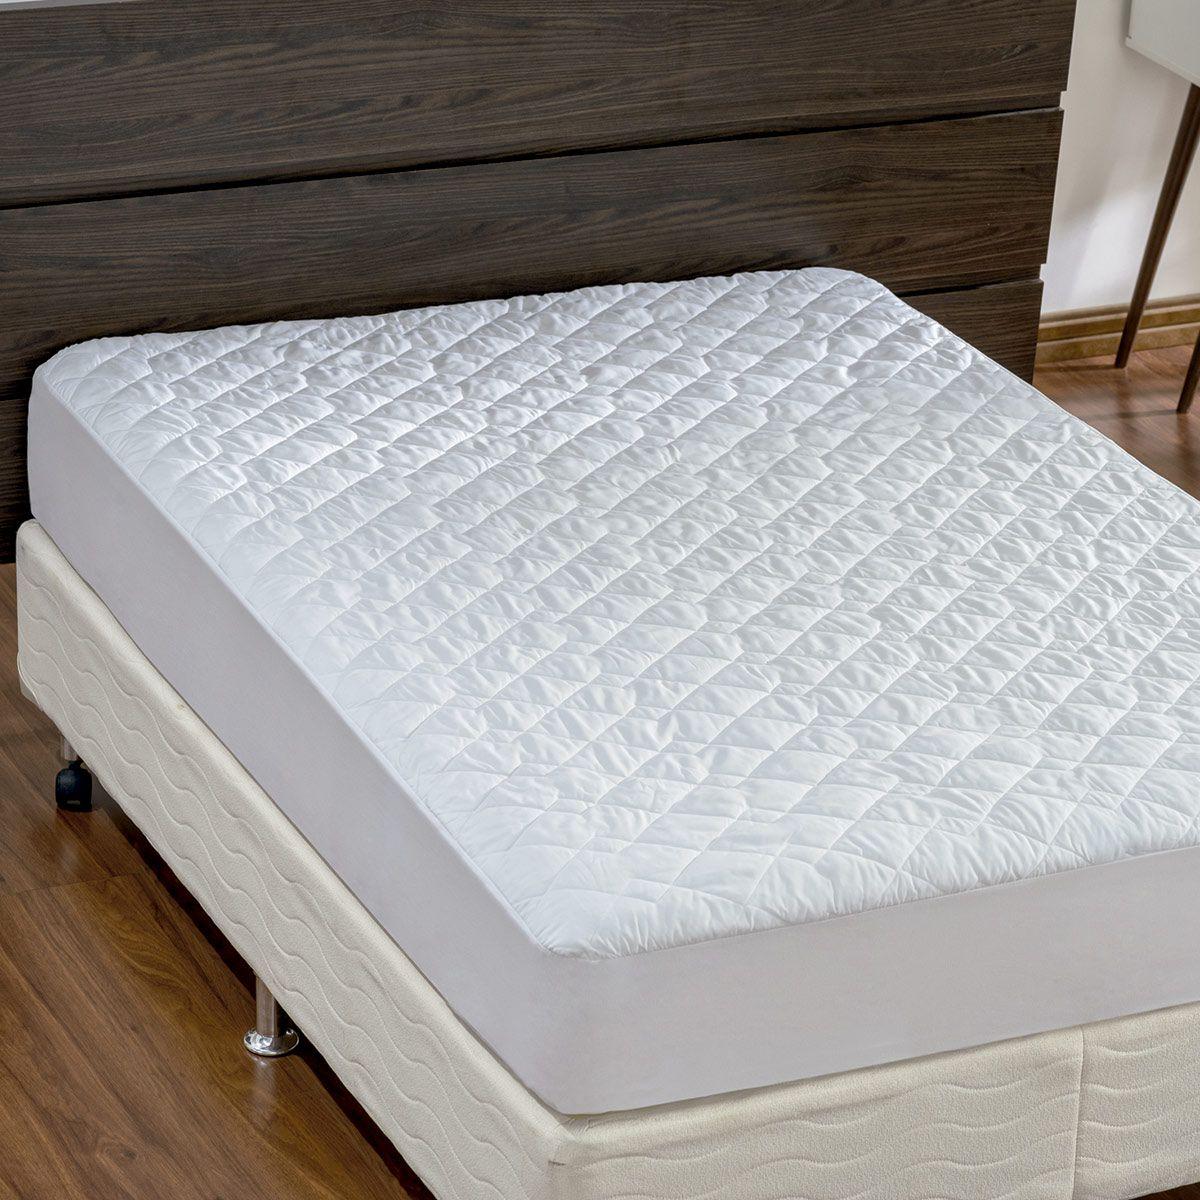 Protetor de Colchão Protect Impermeável Branco Casal Microfibra